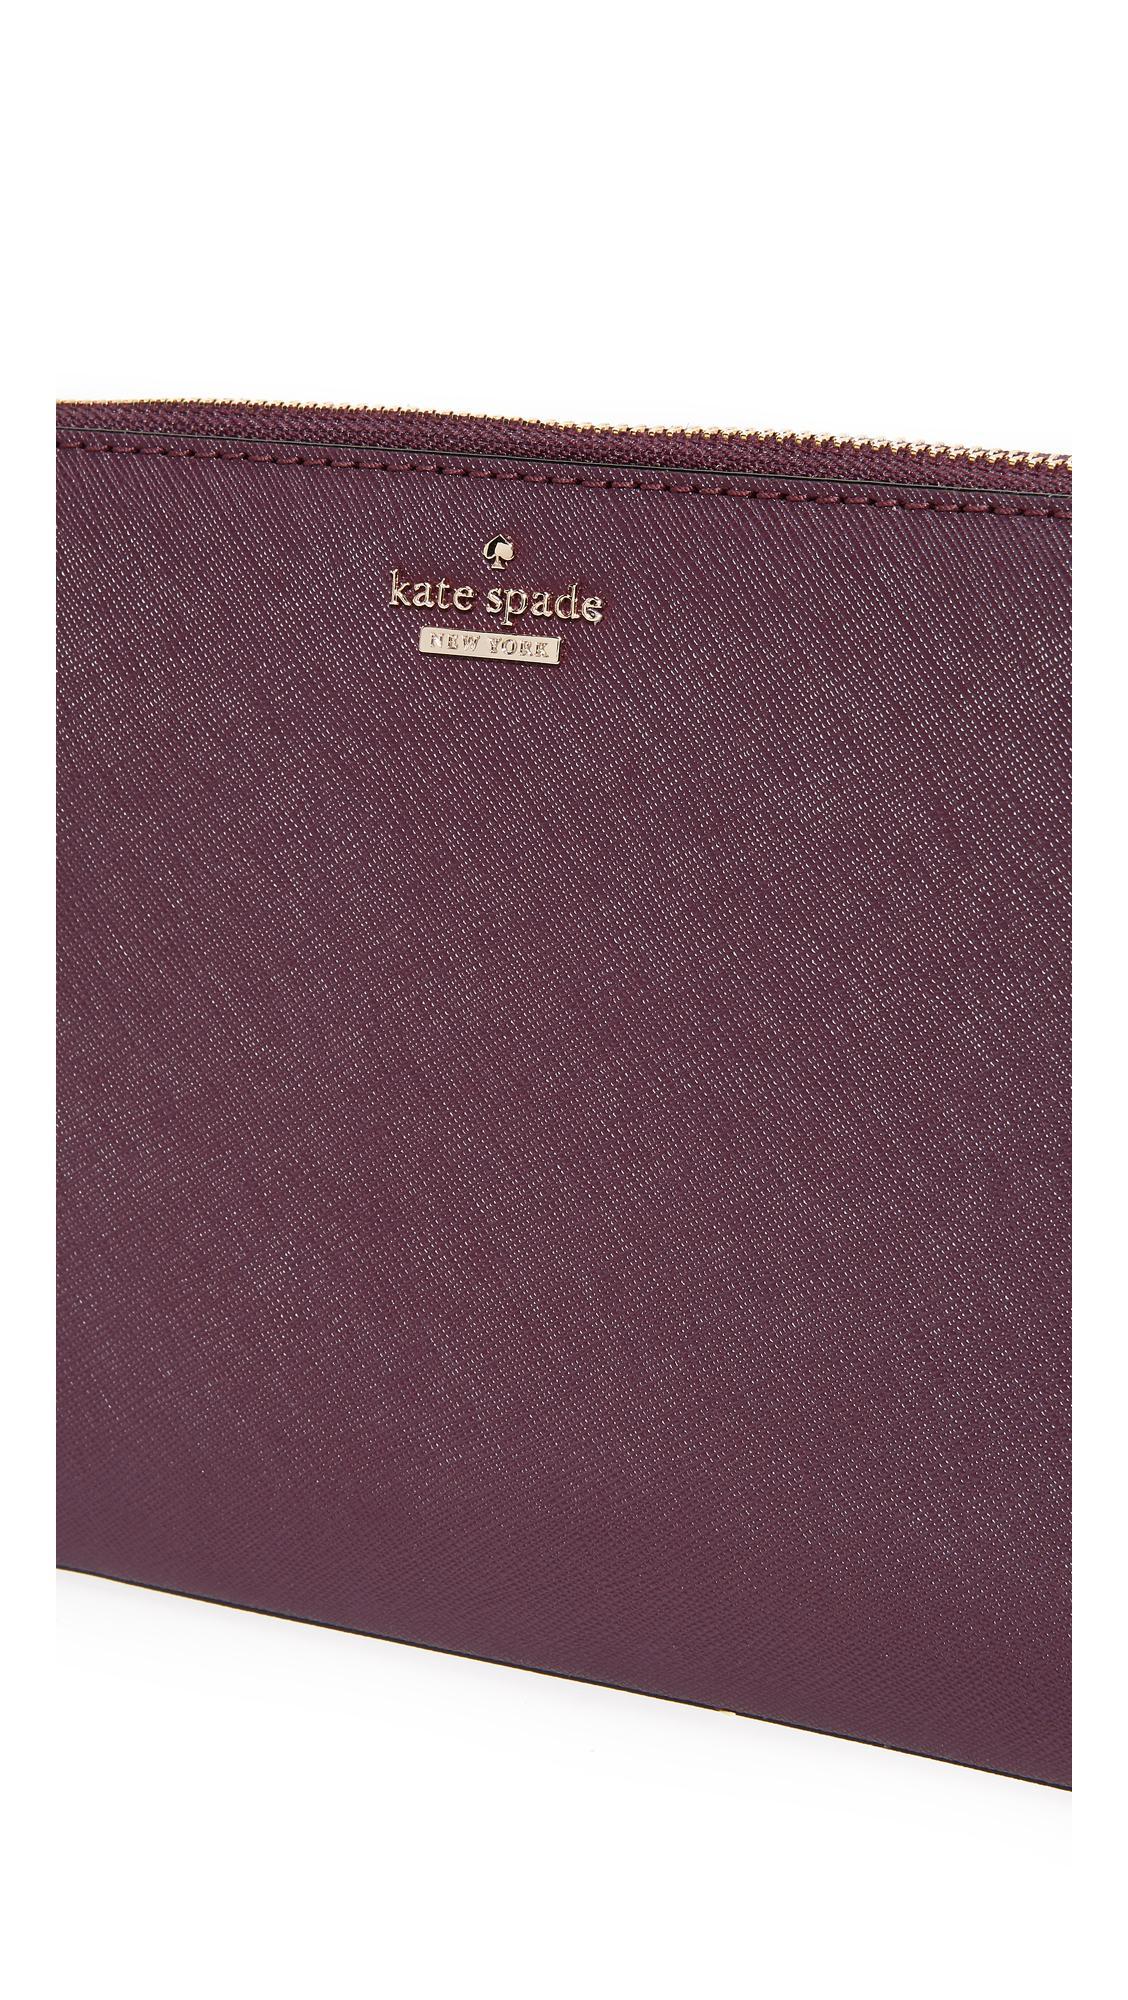 Kate Spade Leather Dilon Cross Body Bag